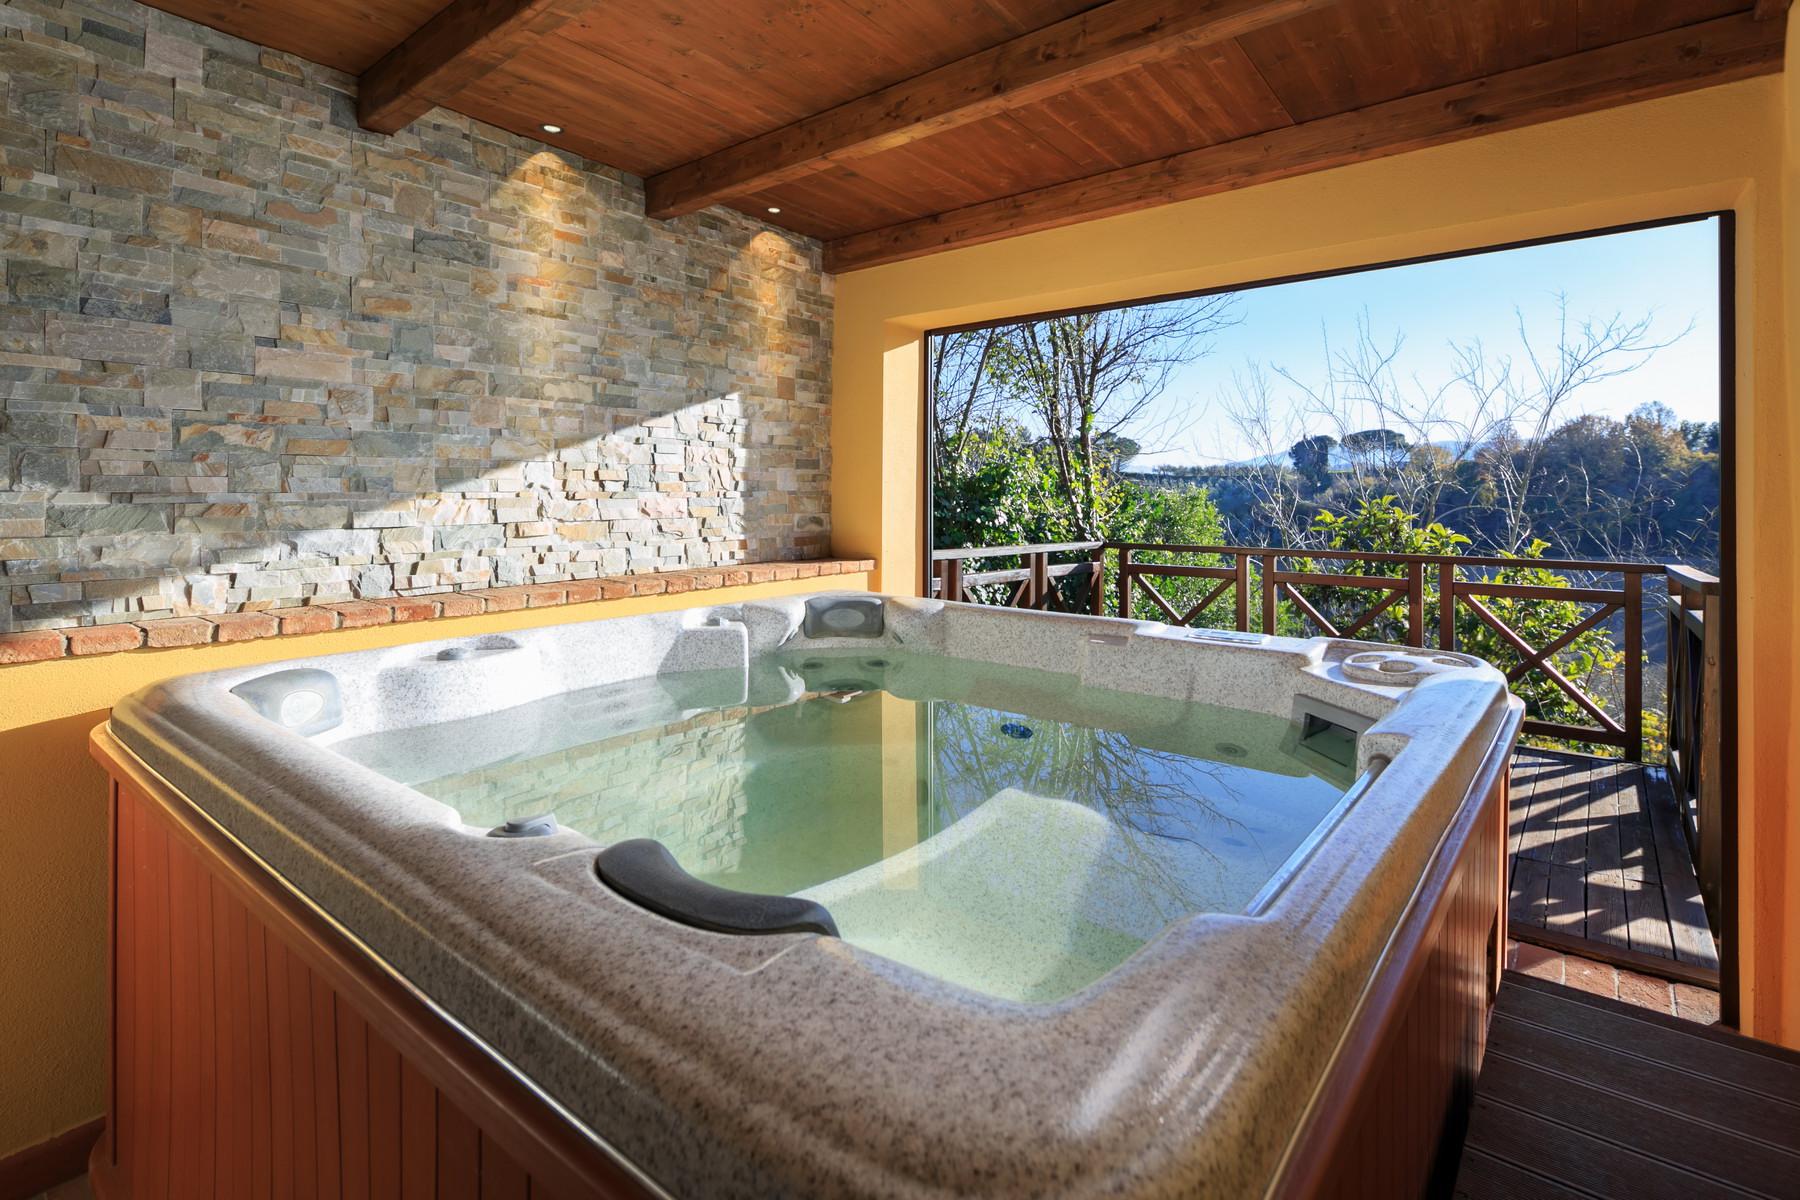 Villa in Vendita a Casciana Terme Lari: 5 locali, 550 mq - Foto 6